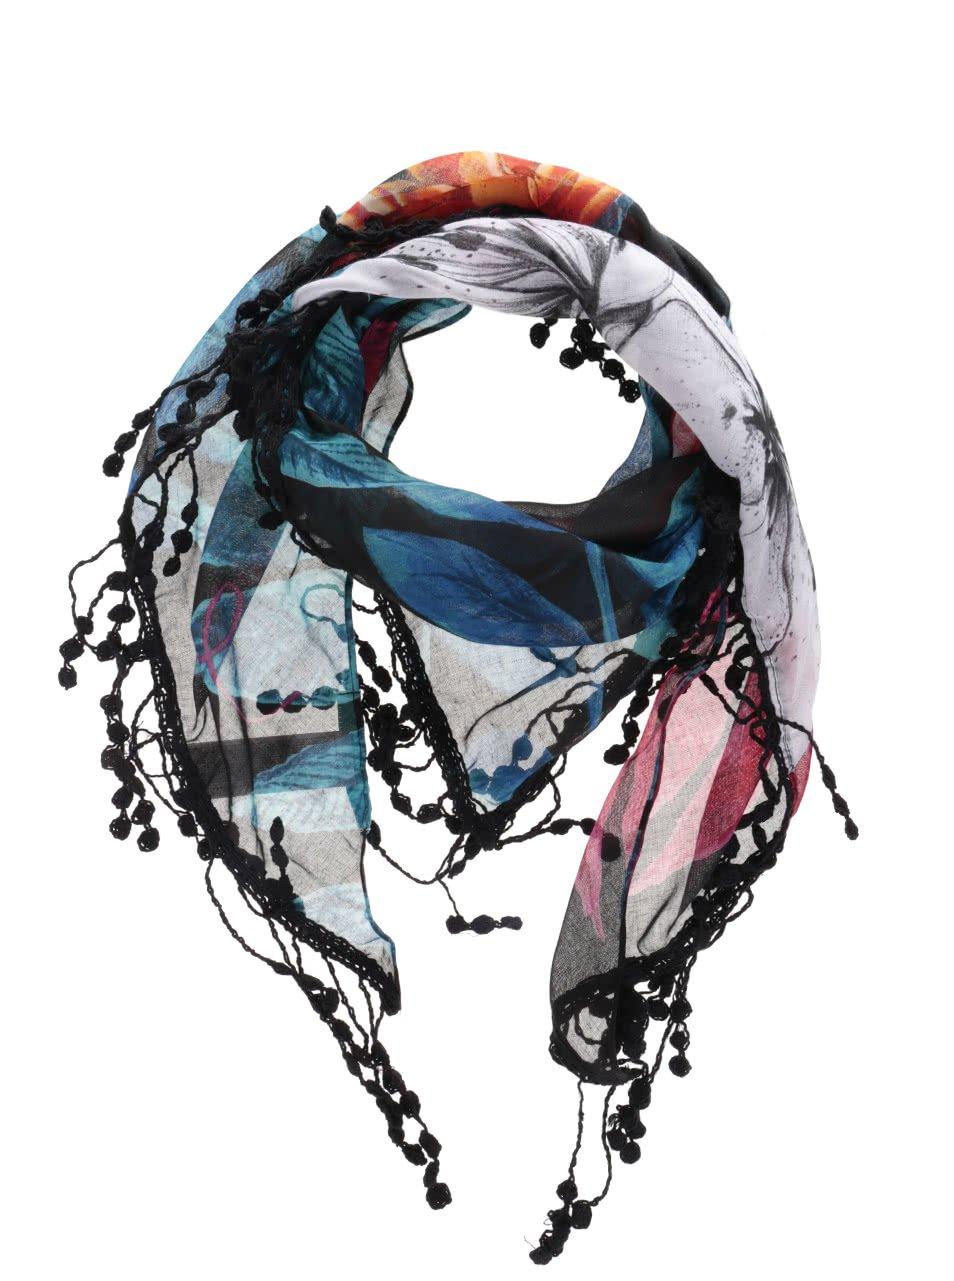 Černý šátek s třásněmi a barevným vzorem Desigual Triangl Spring